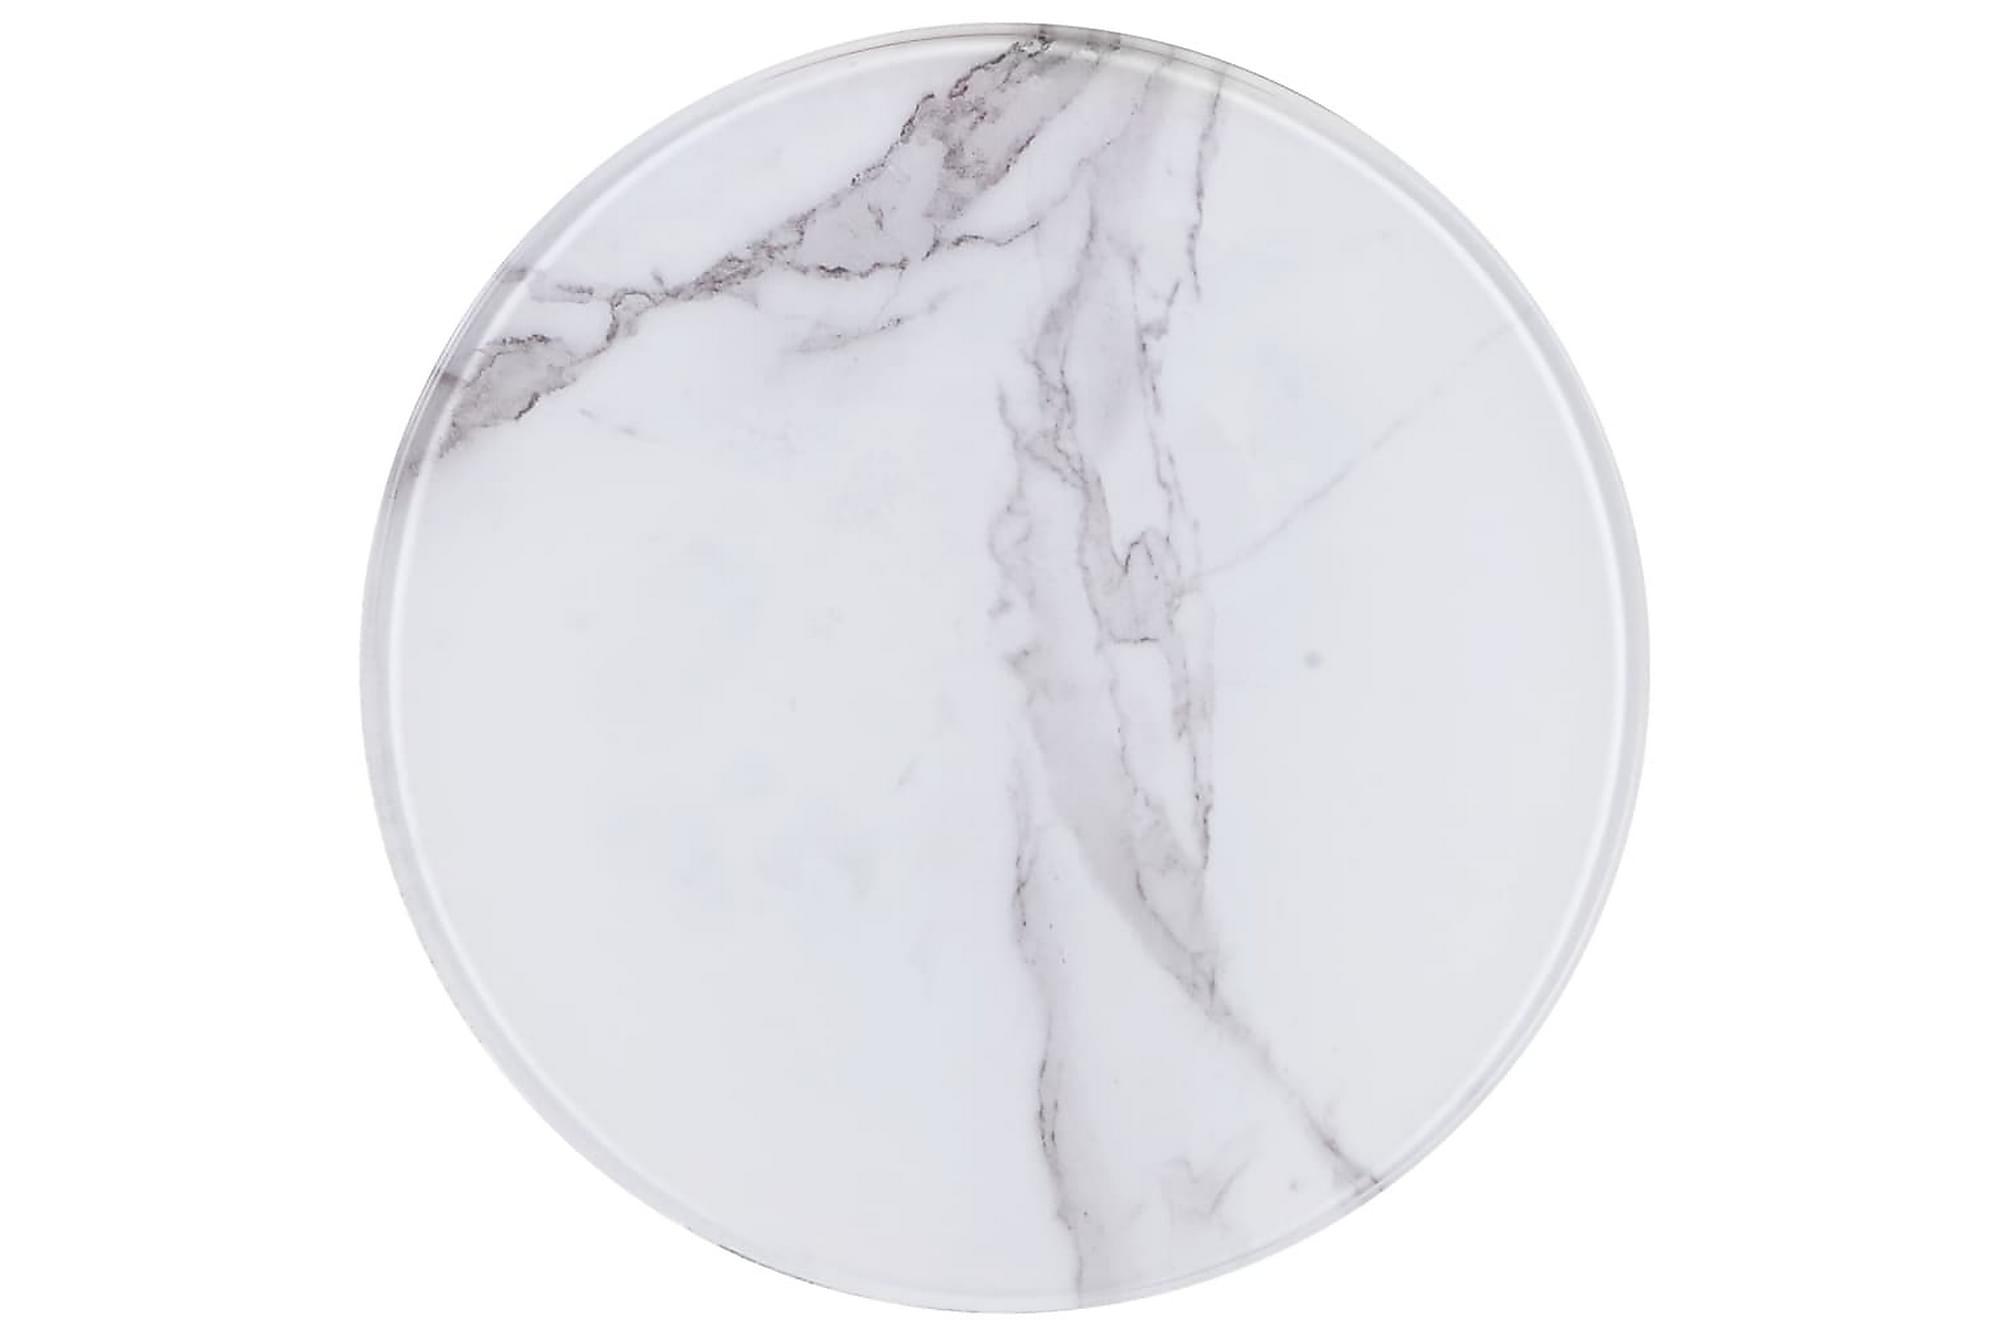 Bordsskiva vit Ã?30 cm glas med marmortextur, Brickbord